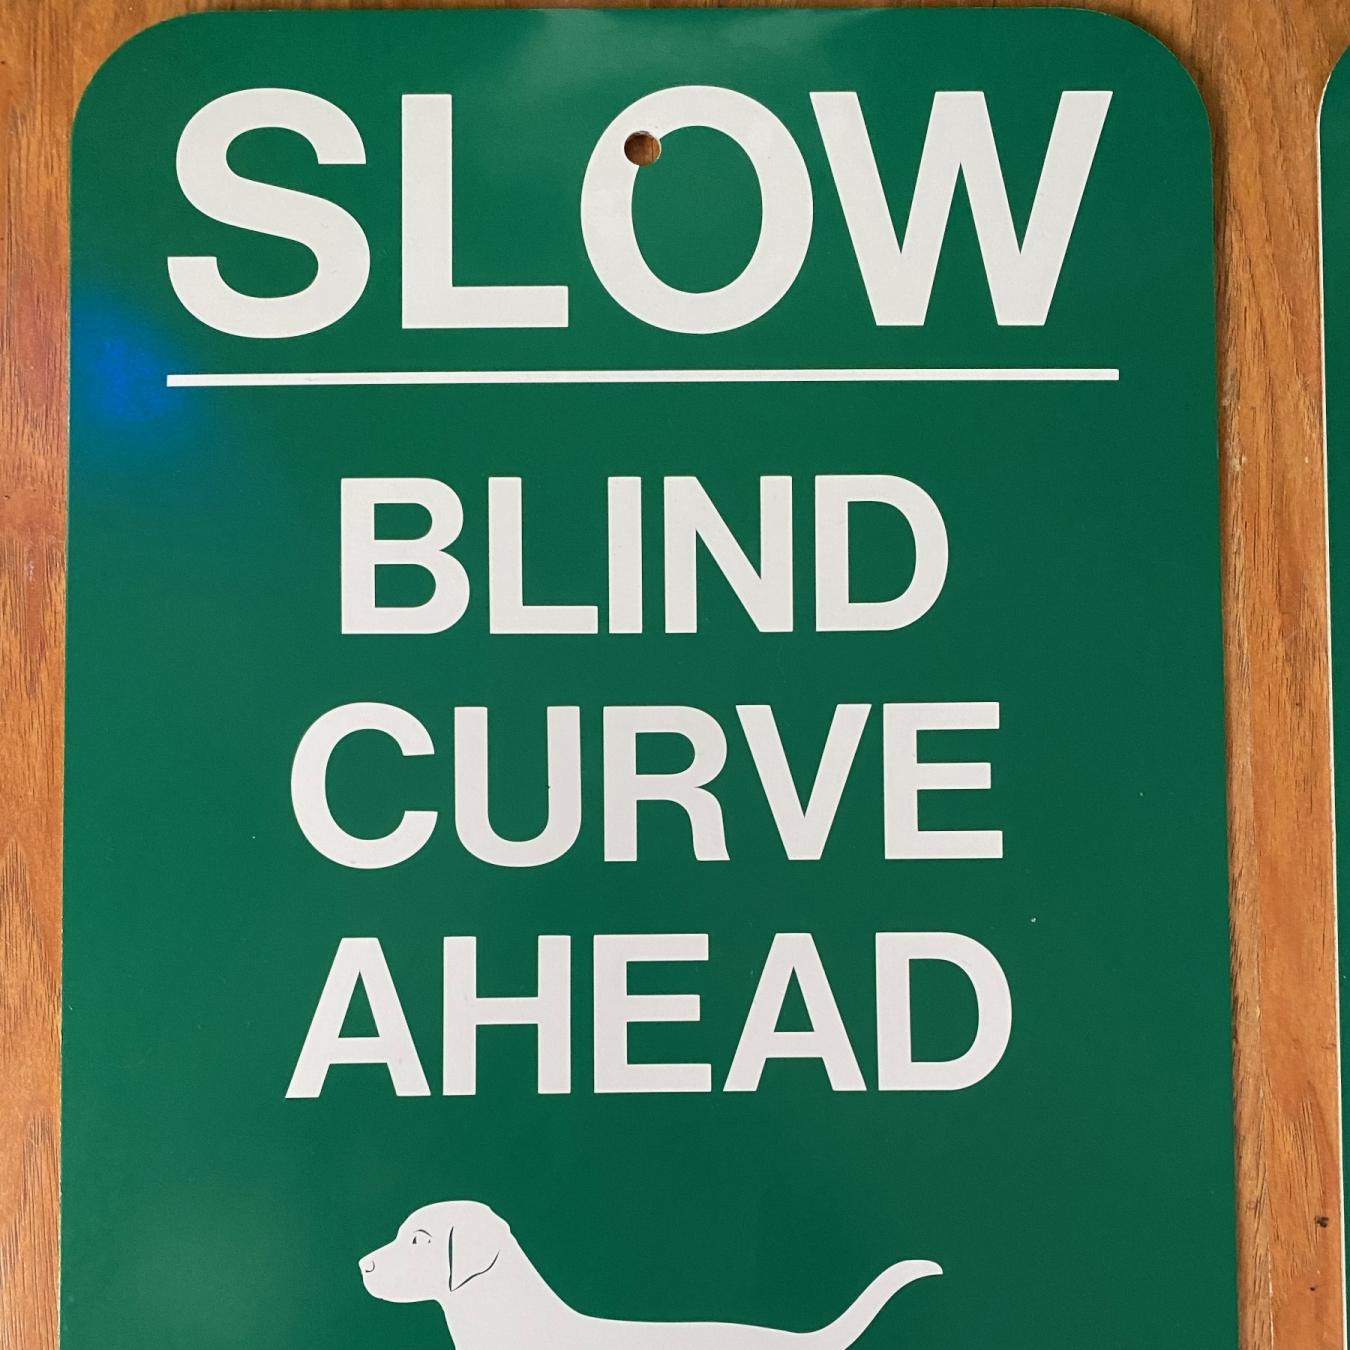 Slow Blind Curve Dog Aluminum Signs